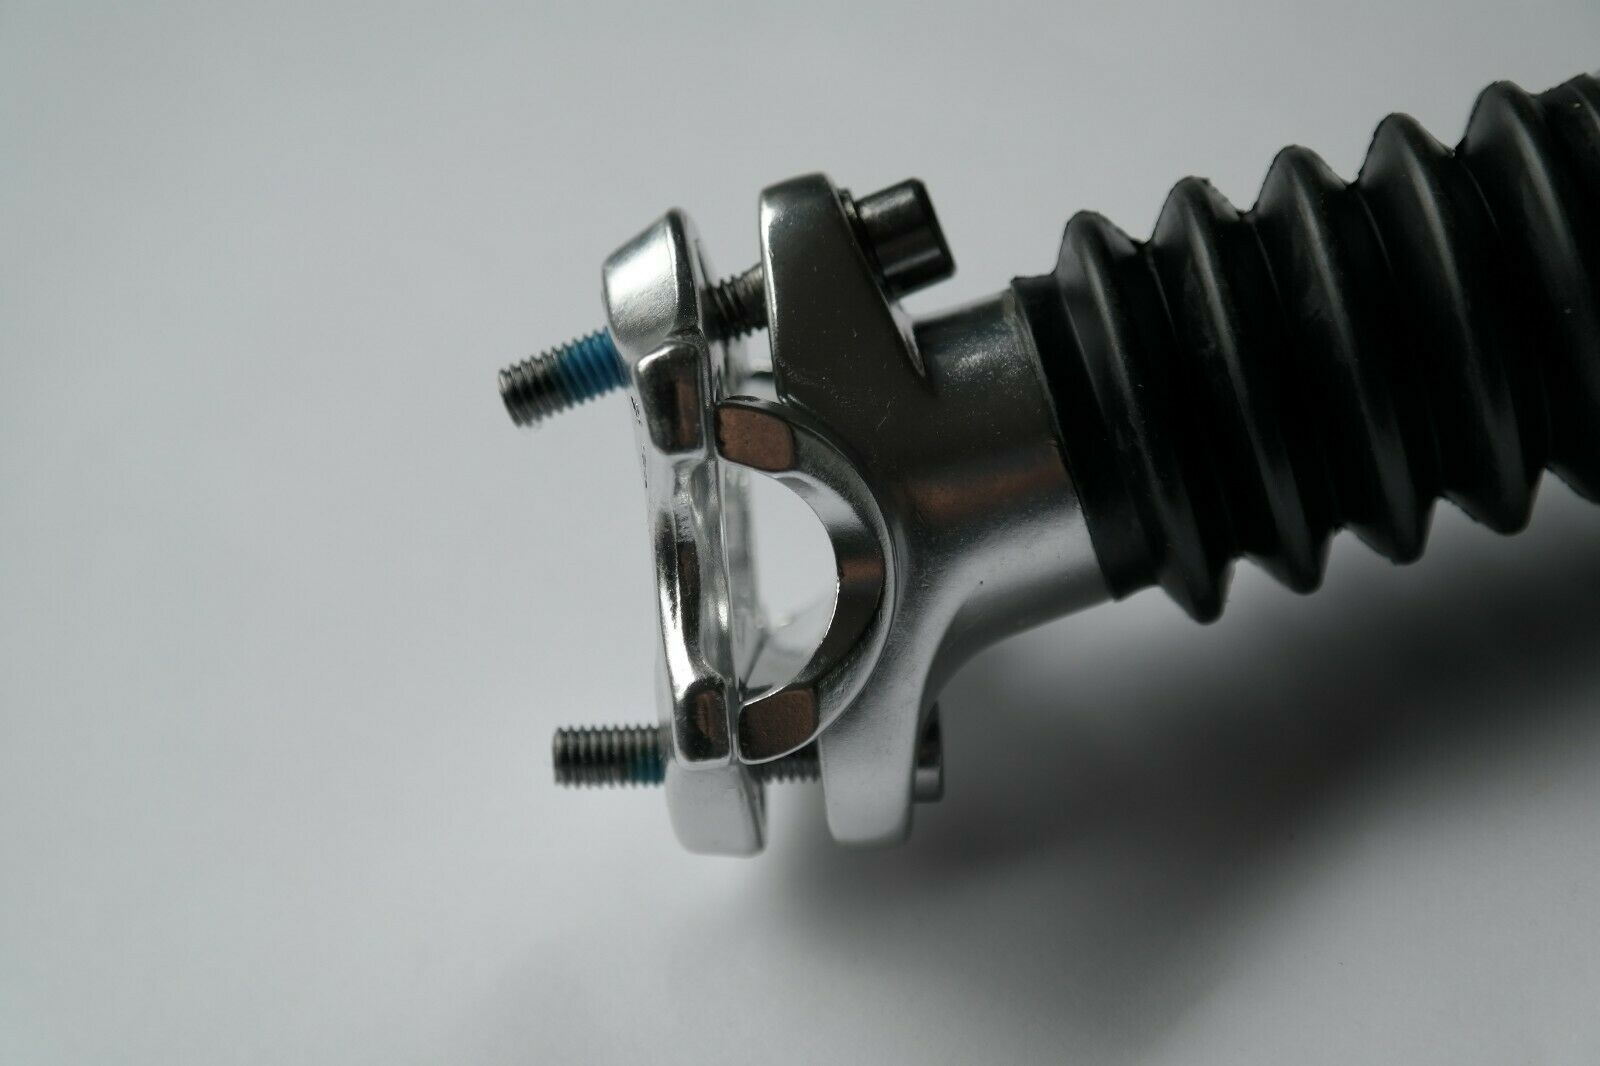 TESTSIEGER Gefederte Sattelstütze HIER 29,8mm ALU MICRO ADJUSTMENT  PAYPAL